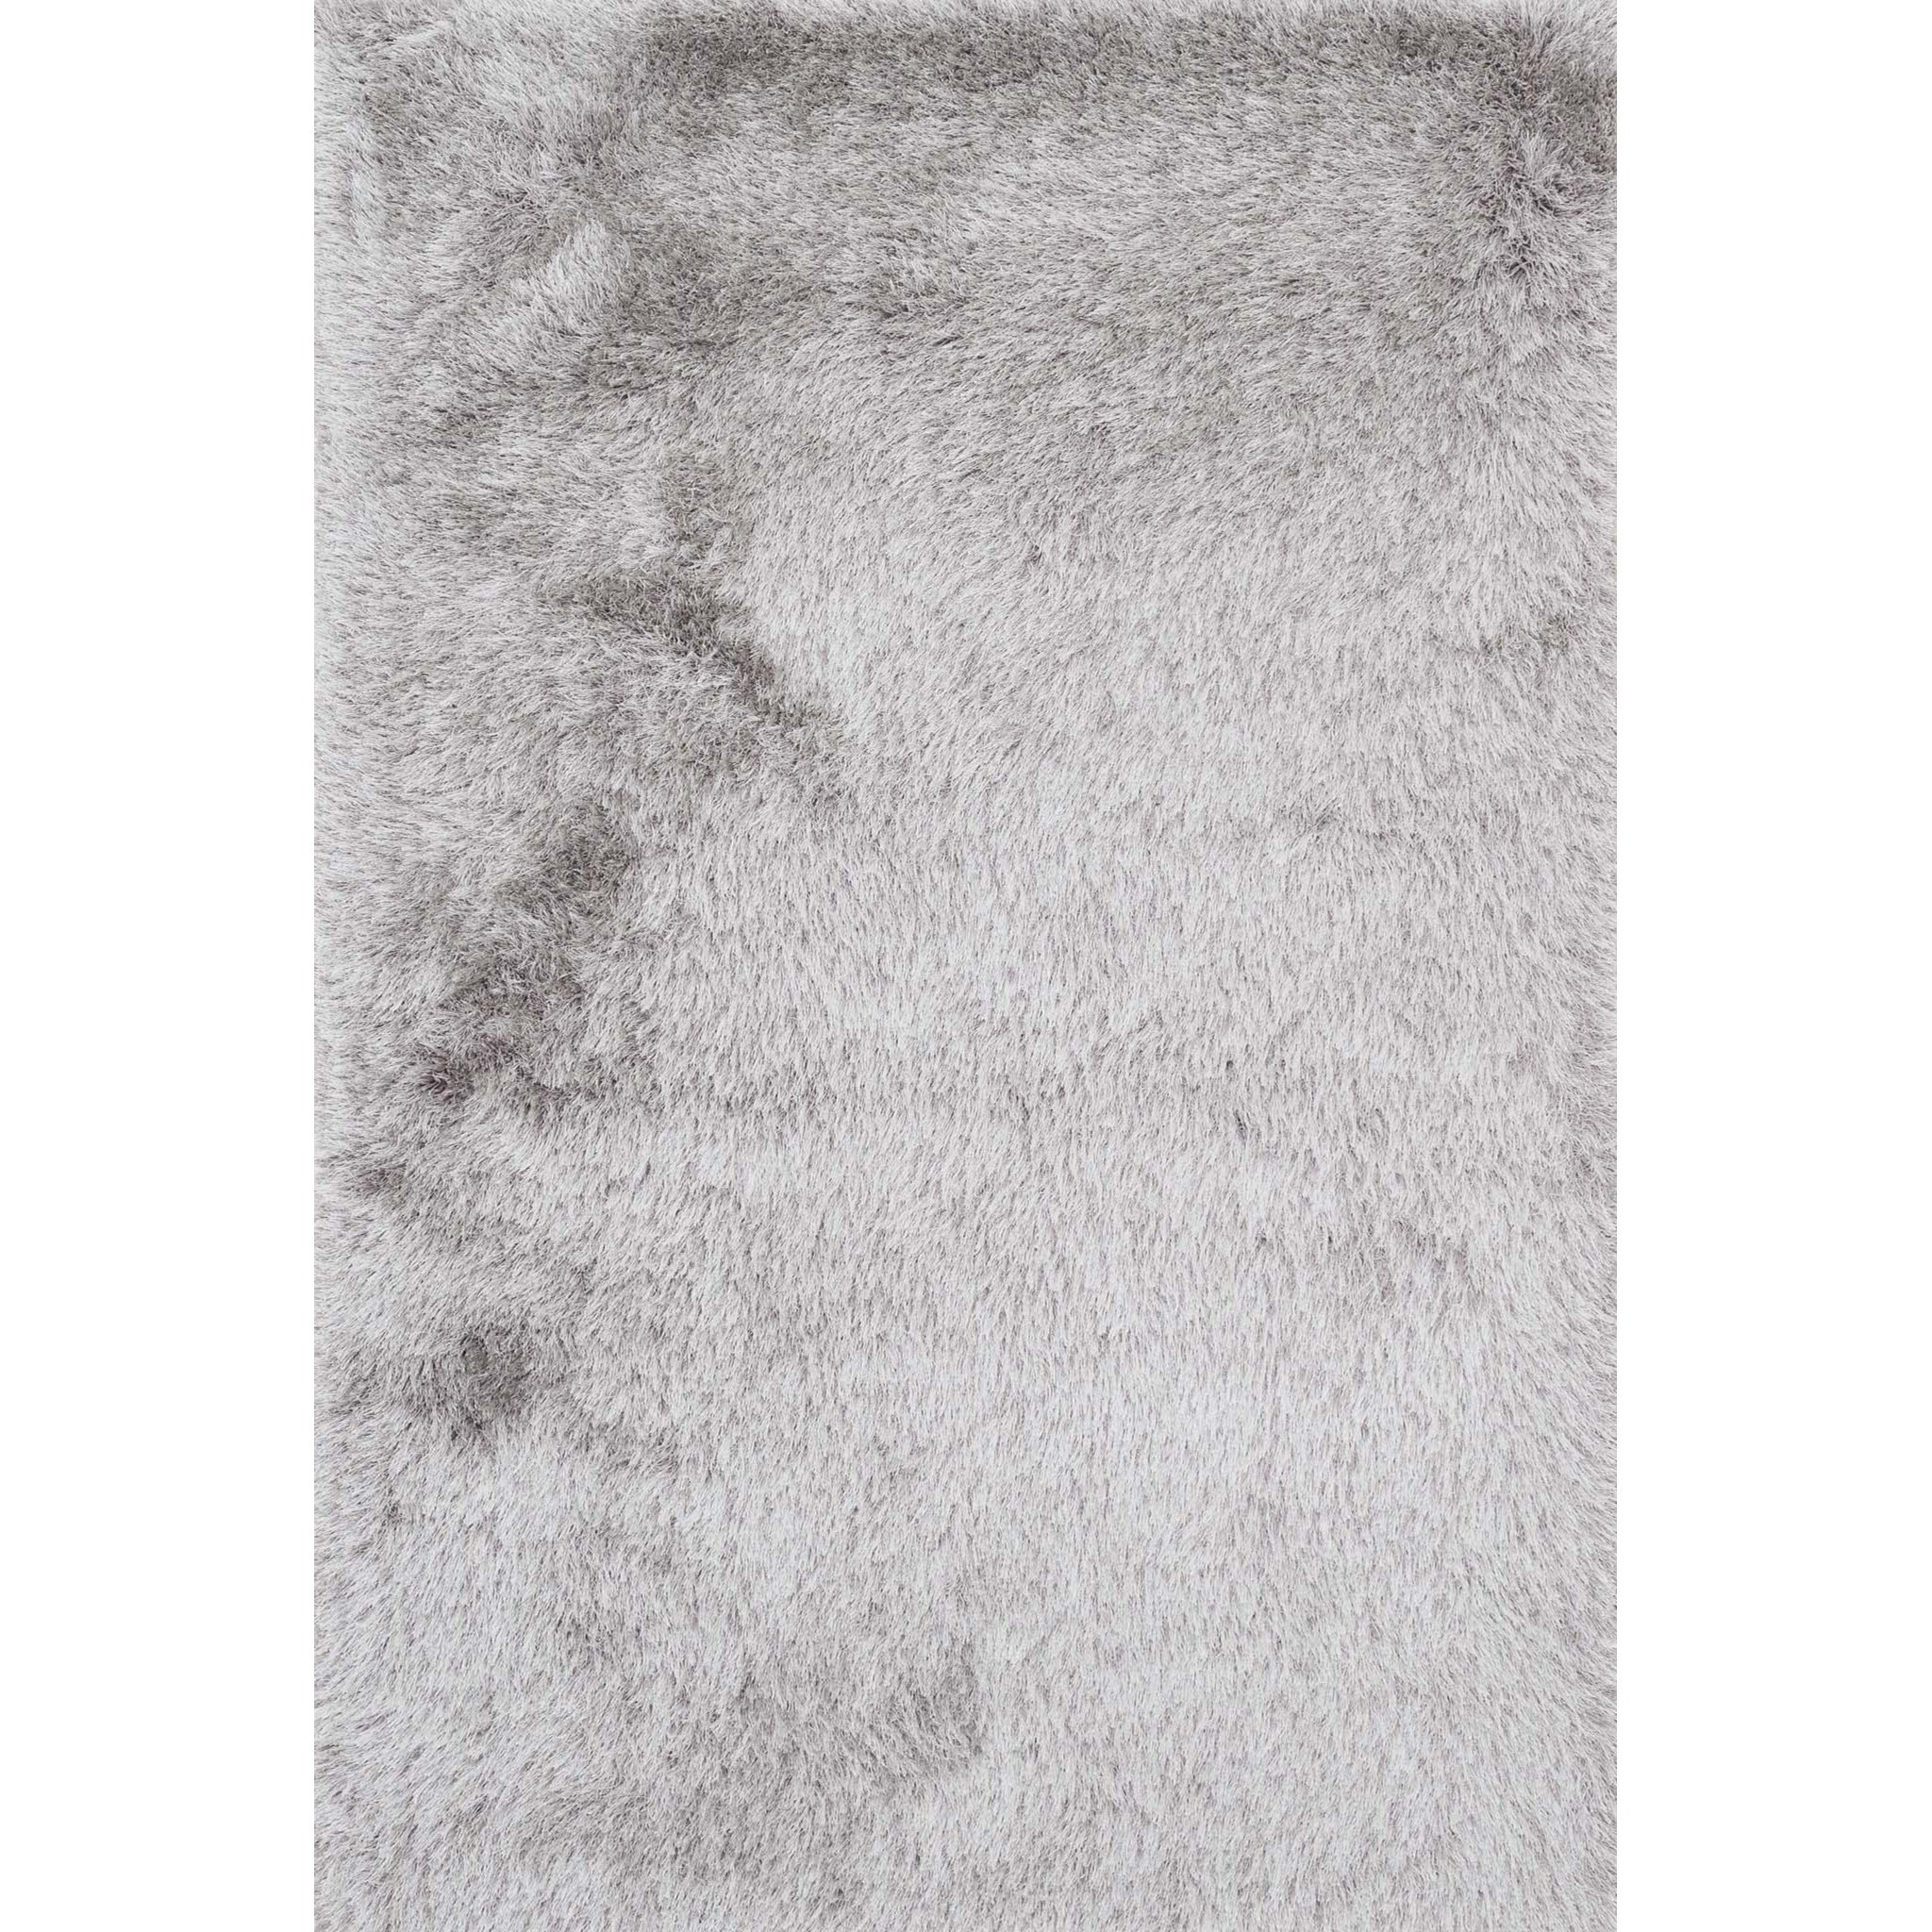 "Orian Shag 2'-3"" x 3'-9"" Area Rug by Loloi Rugs at Virginia Furniture Market"